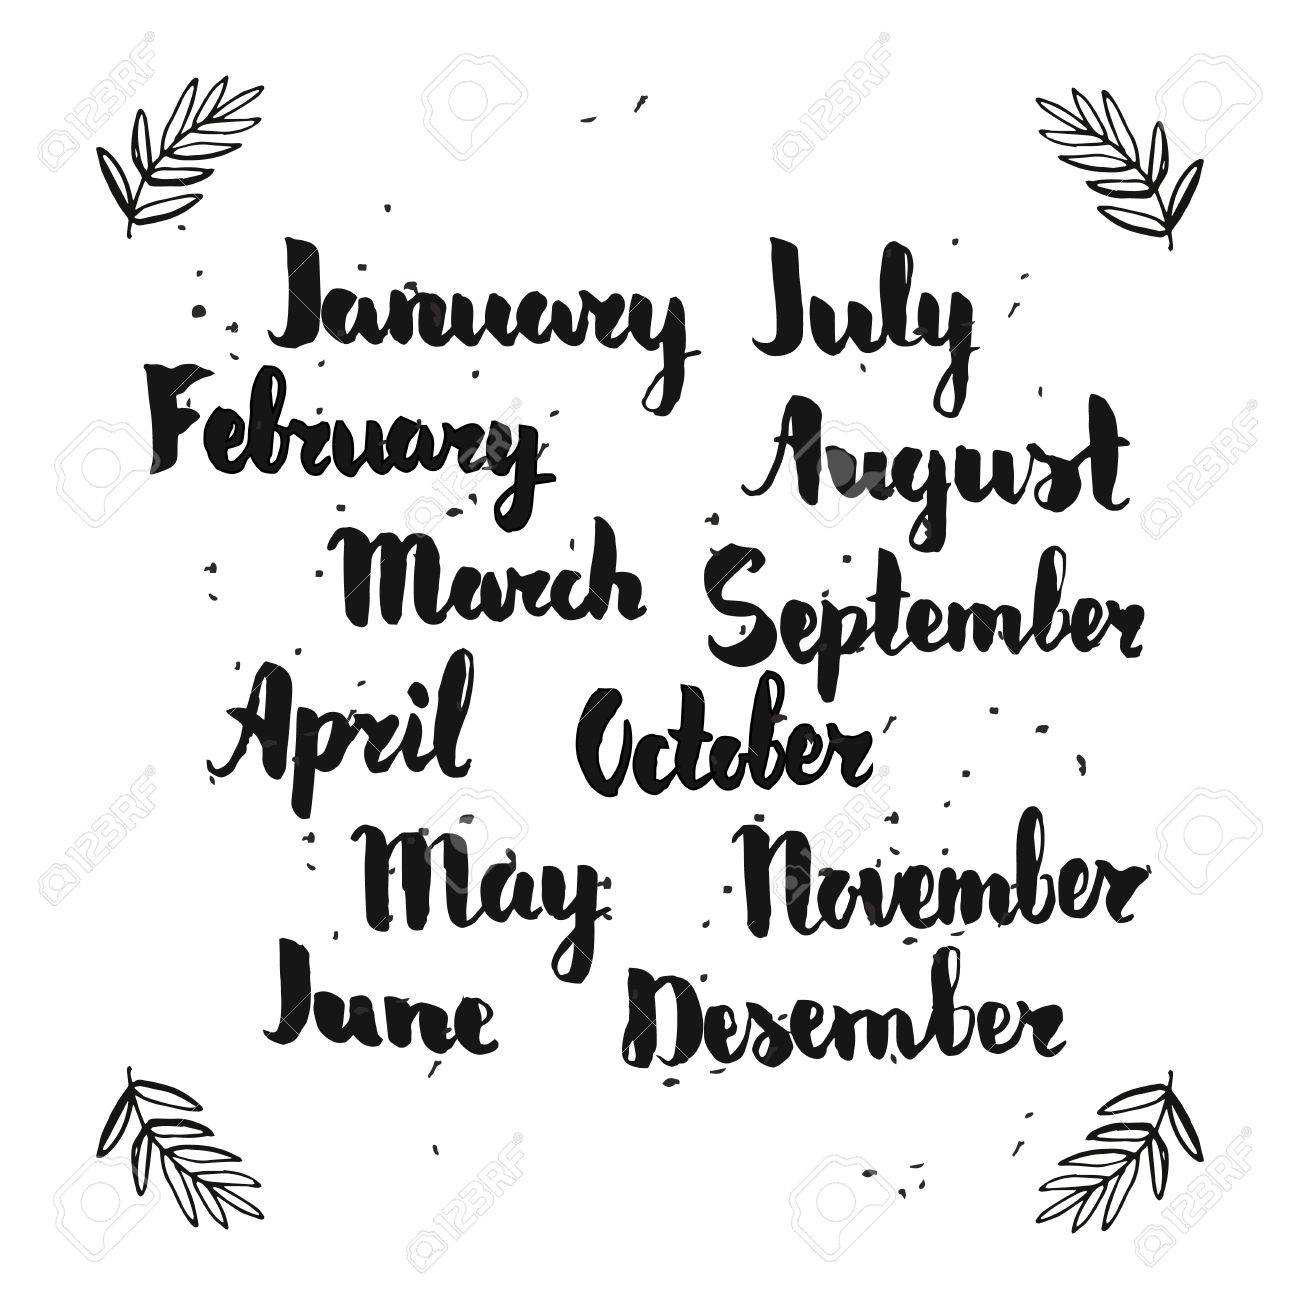 Hand Lettering Of Months Sketch For Calendar Or Planner Royalty